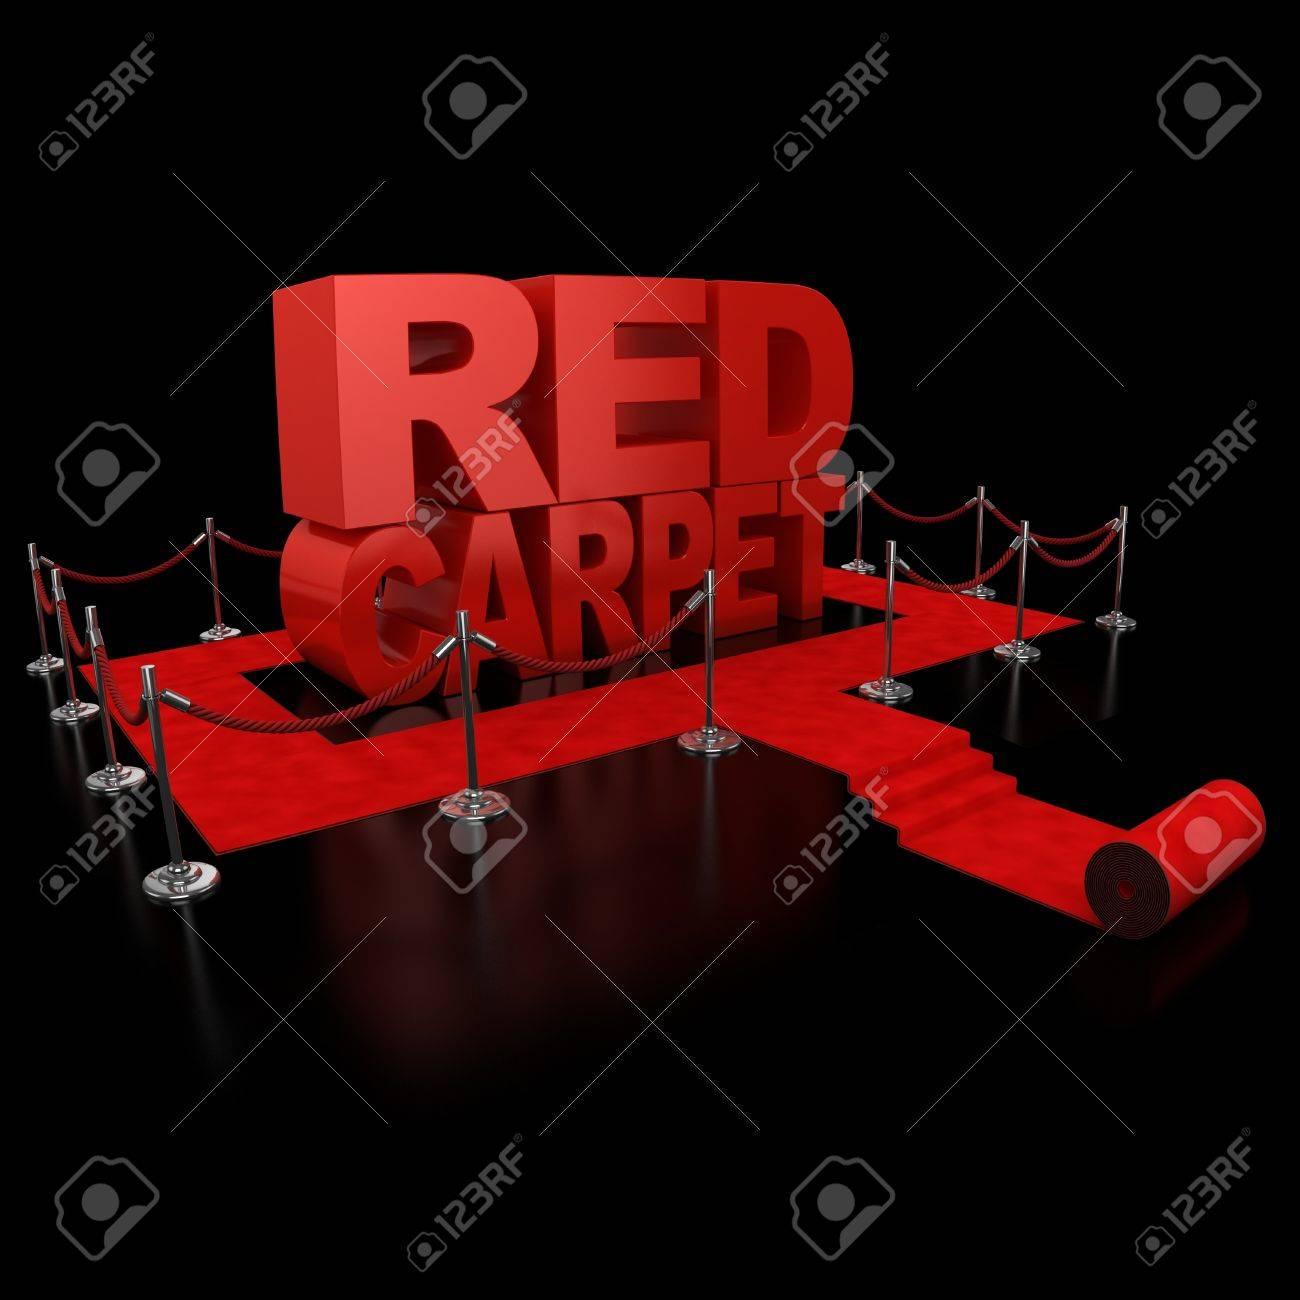 red carpet 3d illustration over over background Stock Photo - 12558267